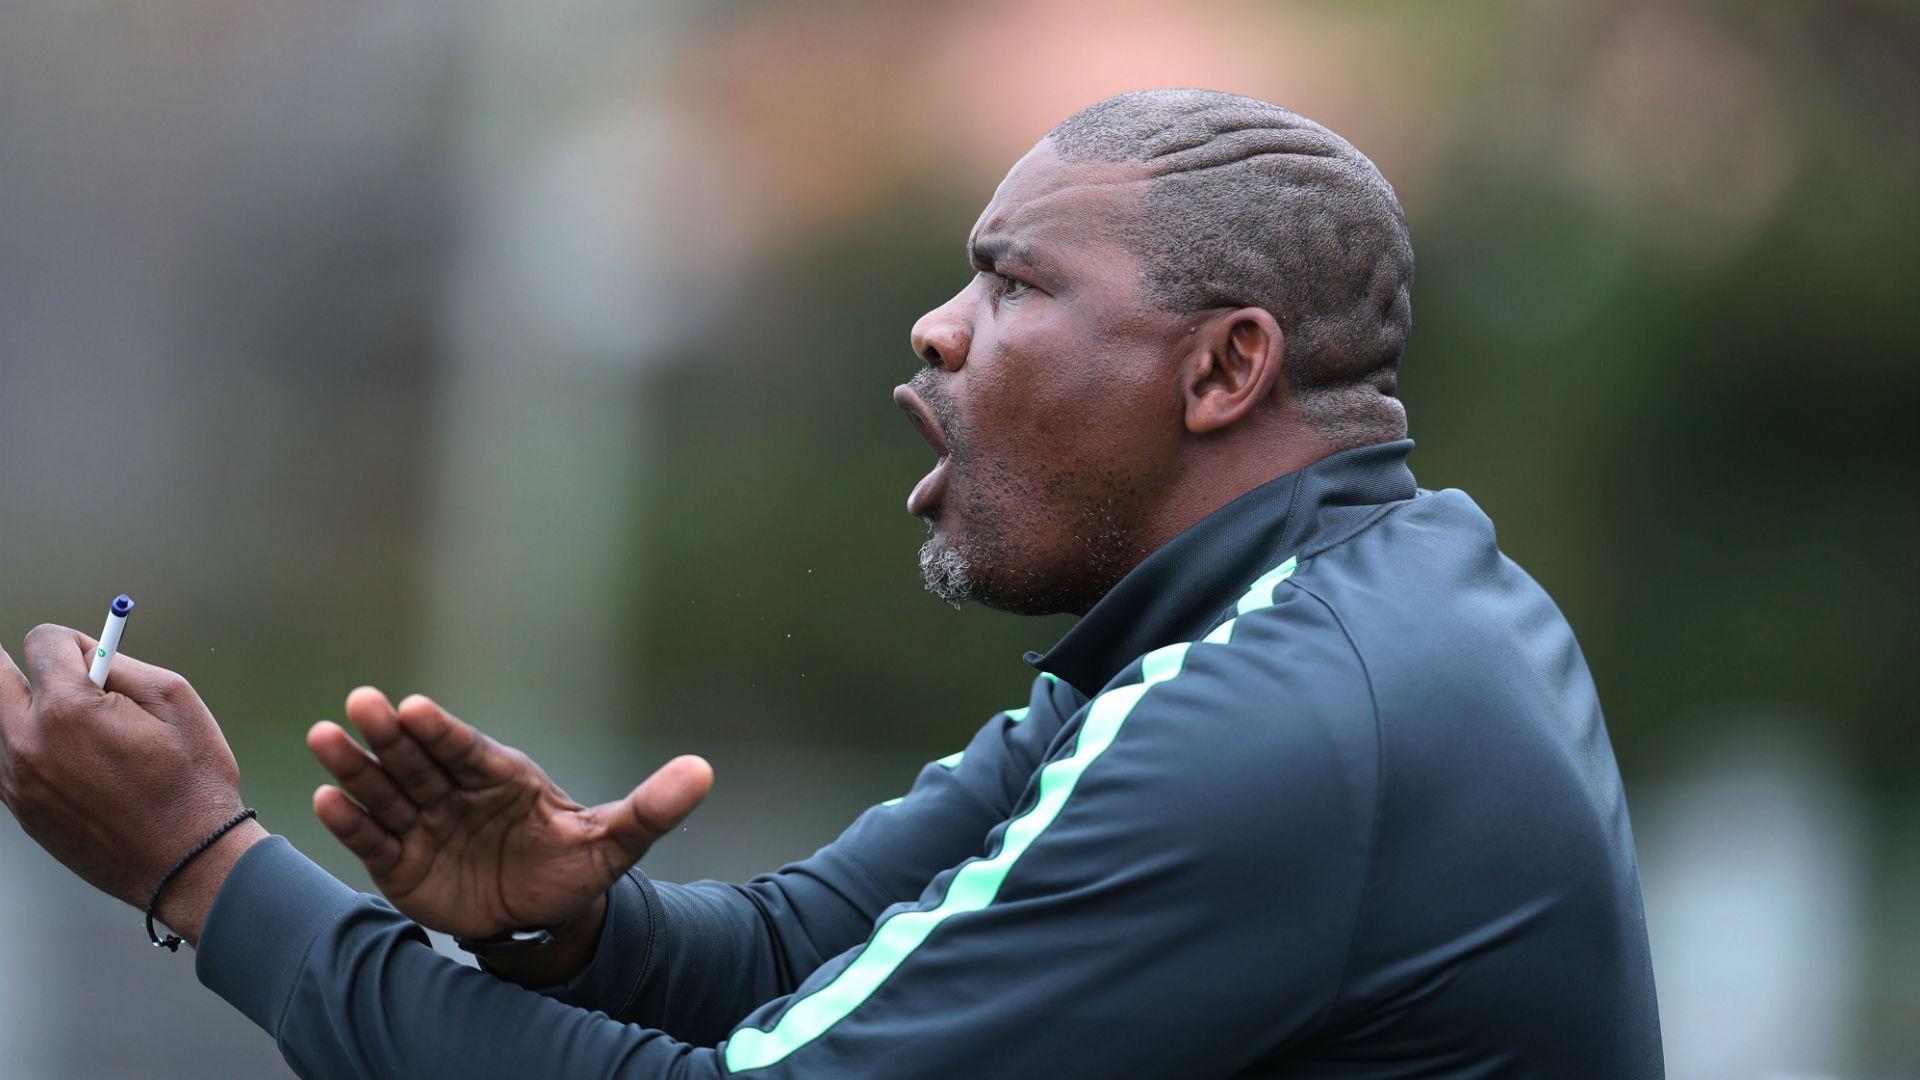 Zungu reacted differently after Bafana Bafana snub - Ntseki